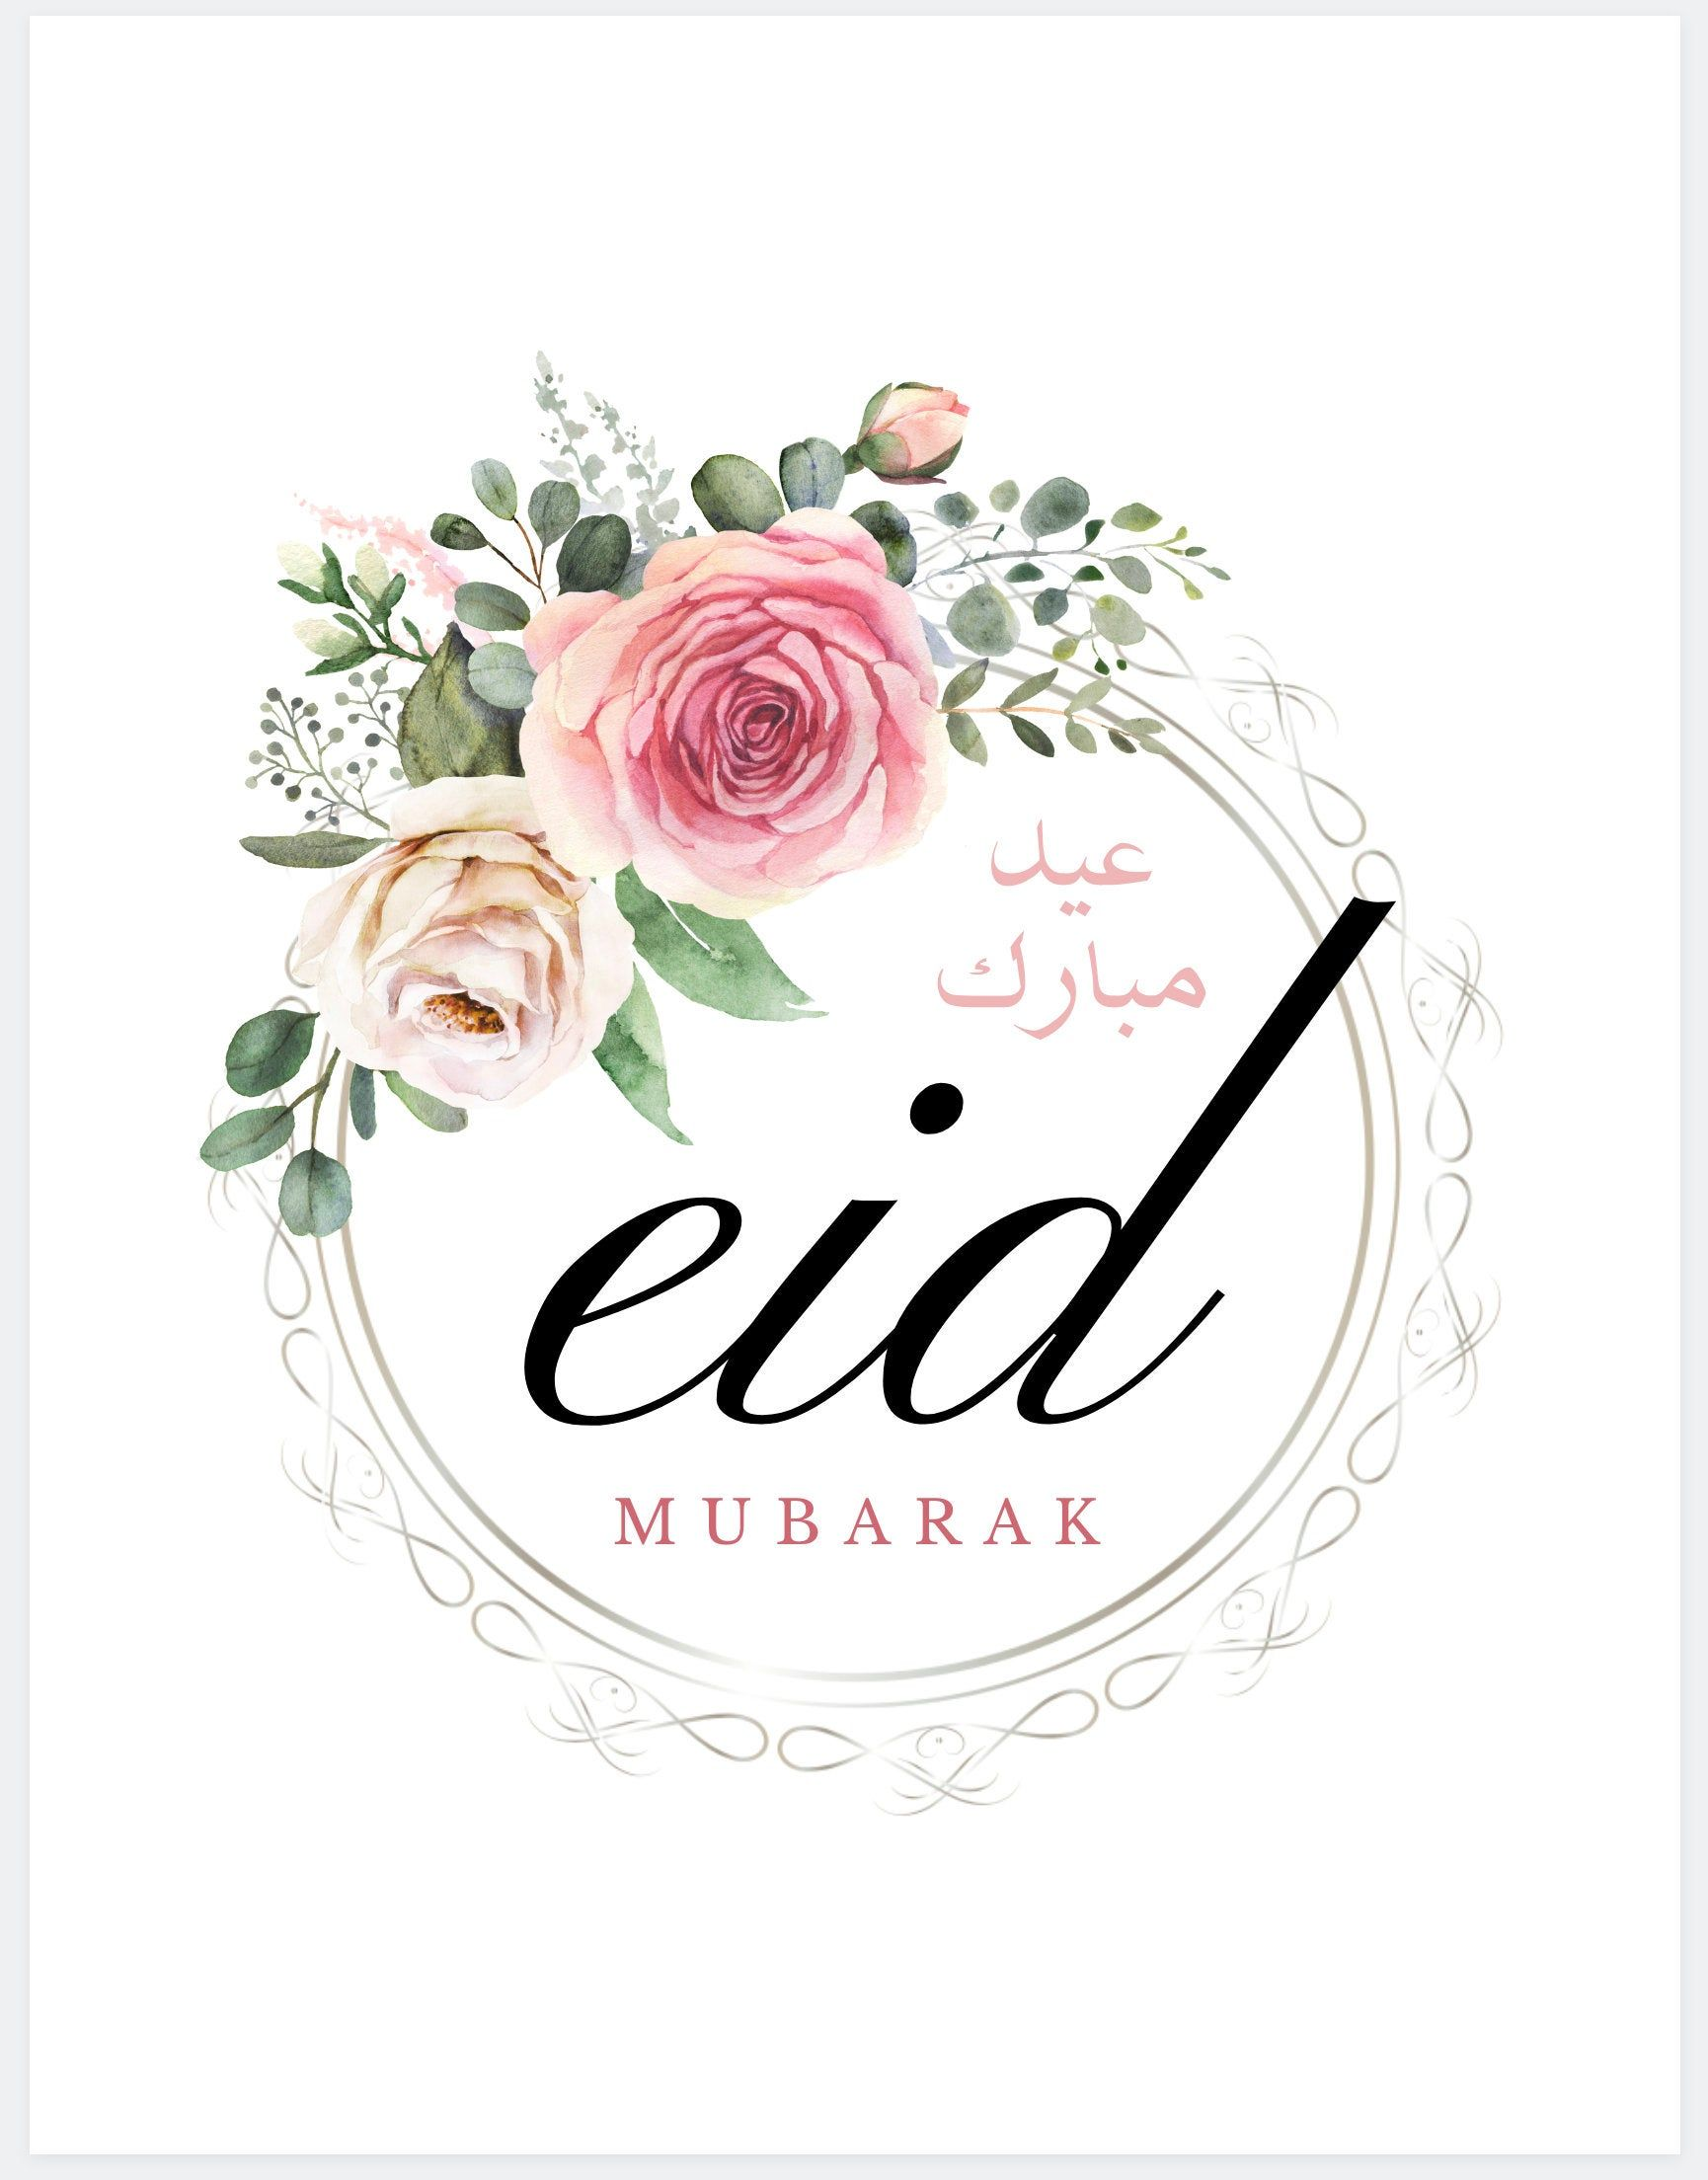 Eid Mubarak Print Printable Happy Eid Decoration Elegant Eid Al Adha Eid Al Fitr Decor Poster Muslim Islamic Holiday Greeting Card Eid Mubarak Card Eid Al Fitr Eid Mubarak Images